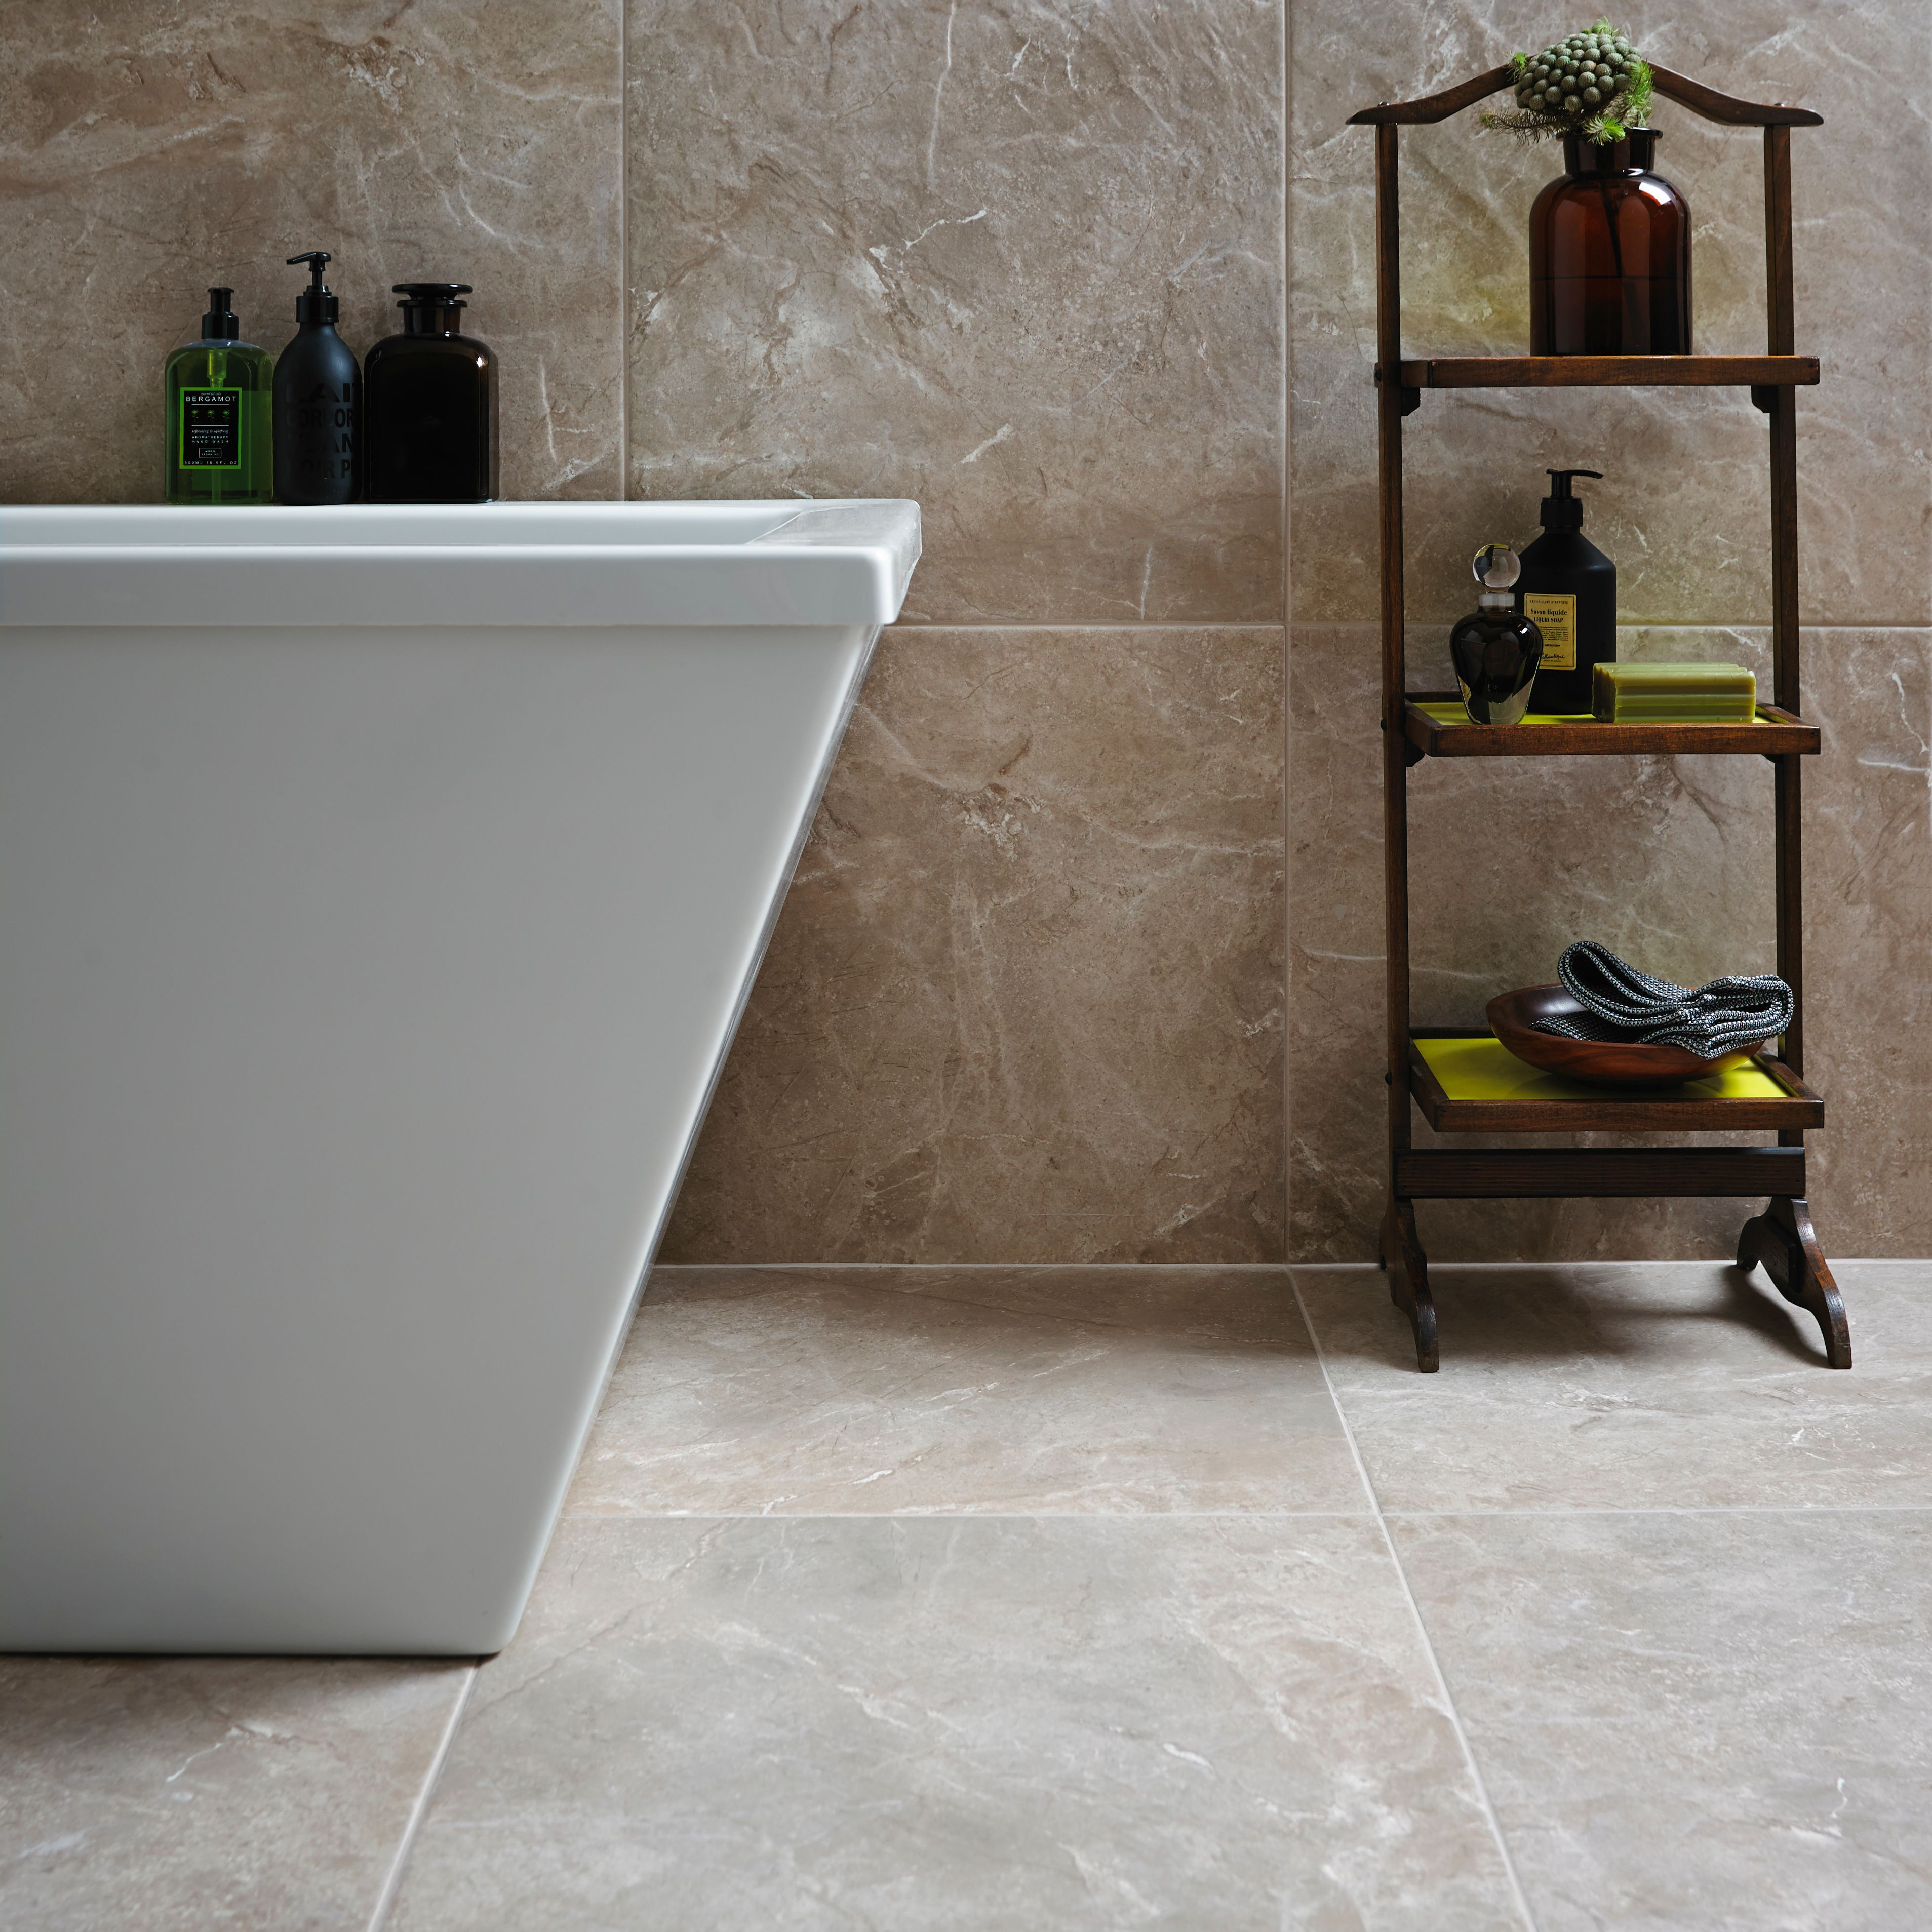 Burlington Limestone Earth Riven Stone Effect Ceramic Wall & Floor Mesmerizing B And Q Bathroom Design 2018